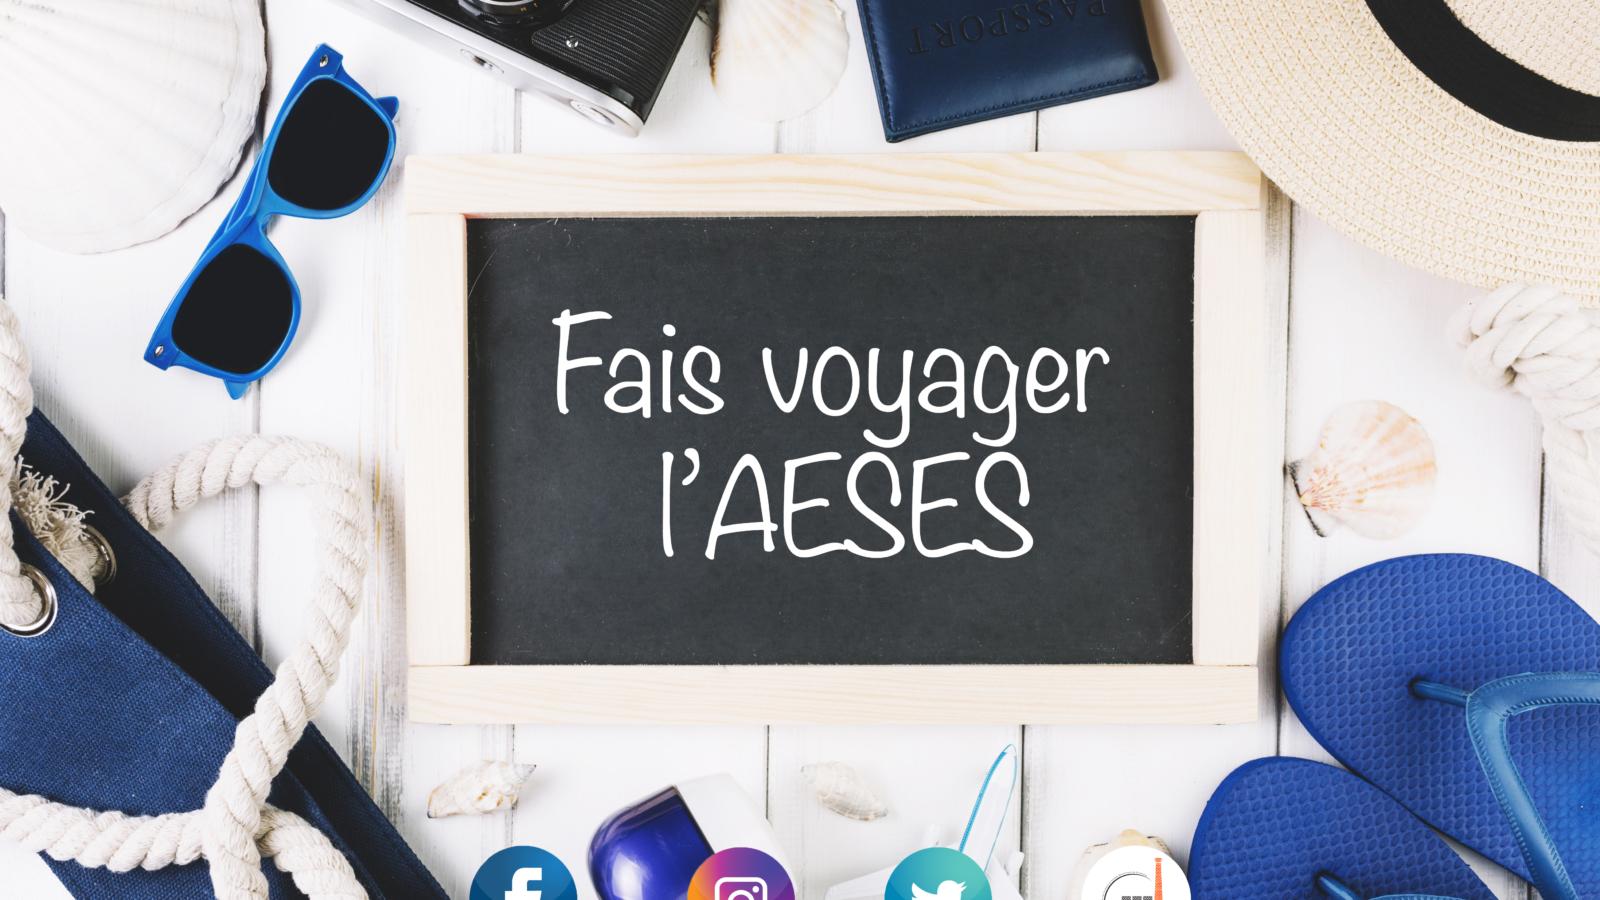 Fais voyager AESES